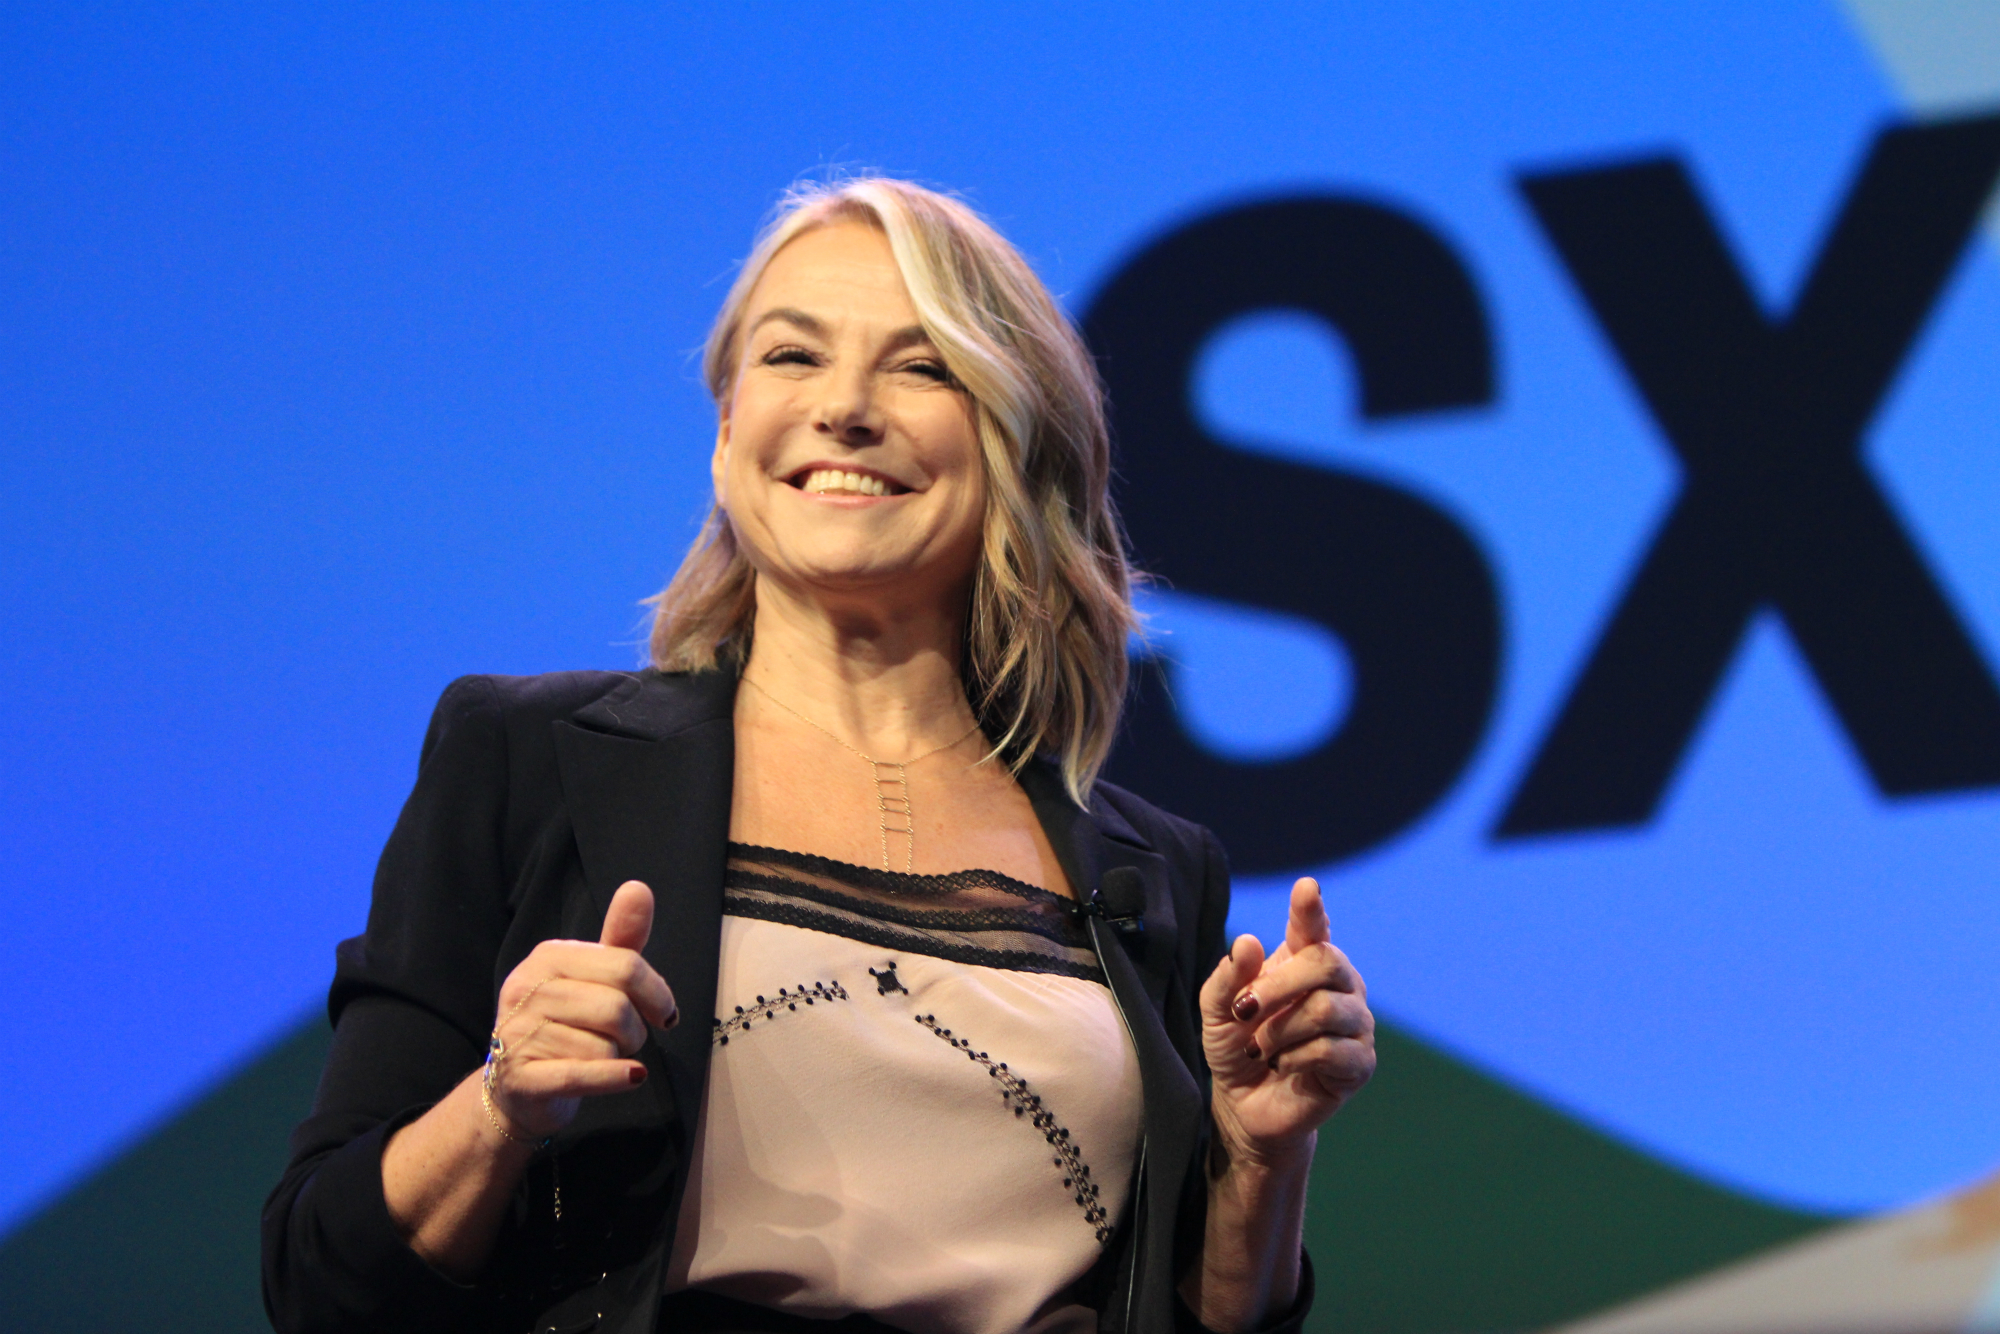 Esther Perel Keynote, photo by Heather Kaplan